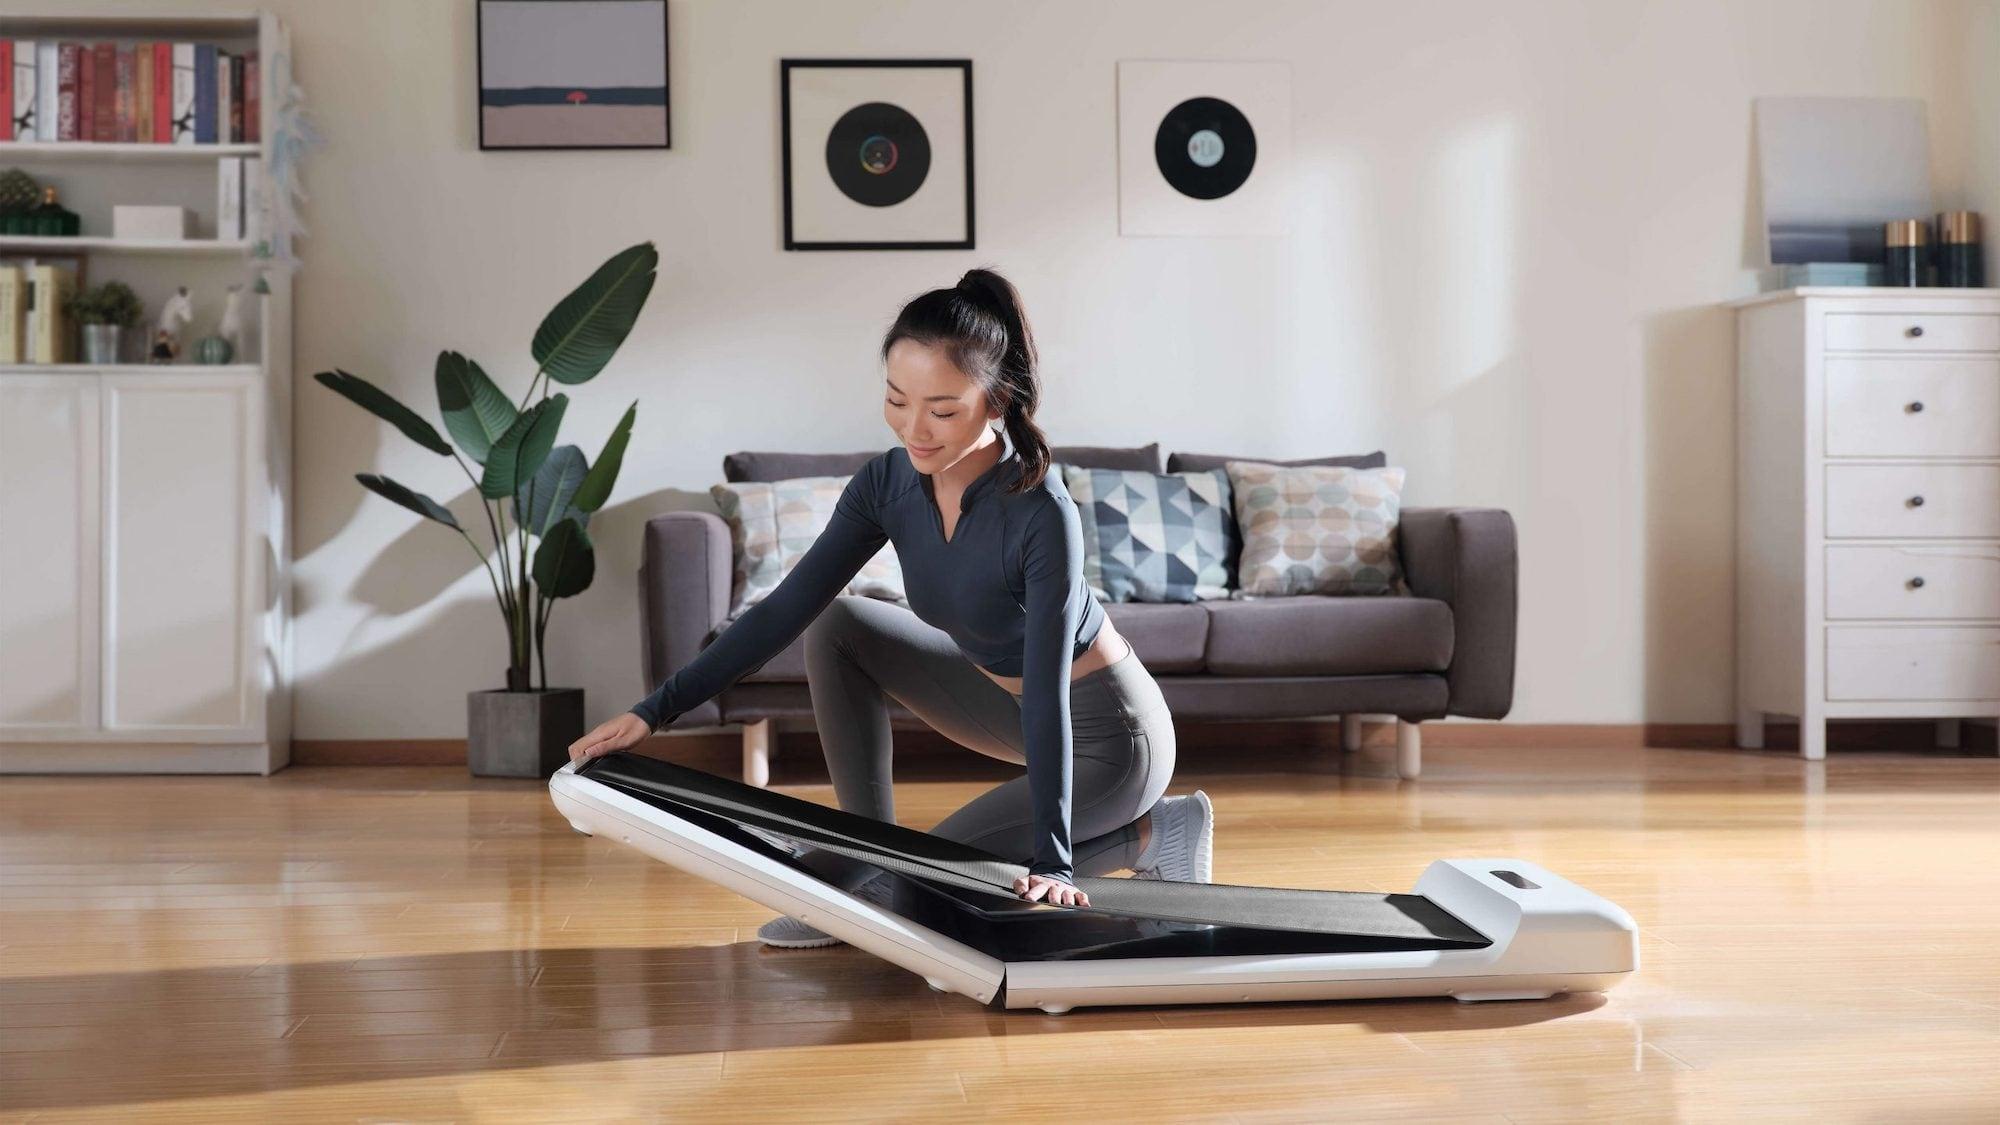 WalkingPad S1 Foldable Workout Device has a 180º hinge to save space